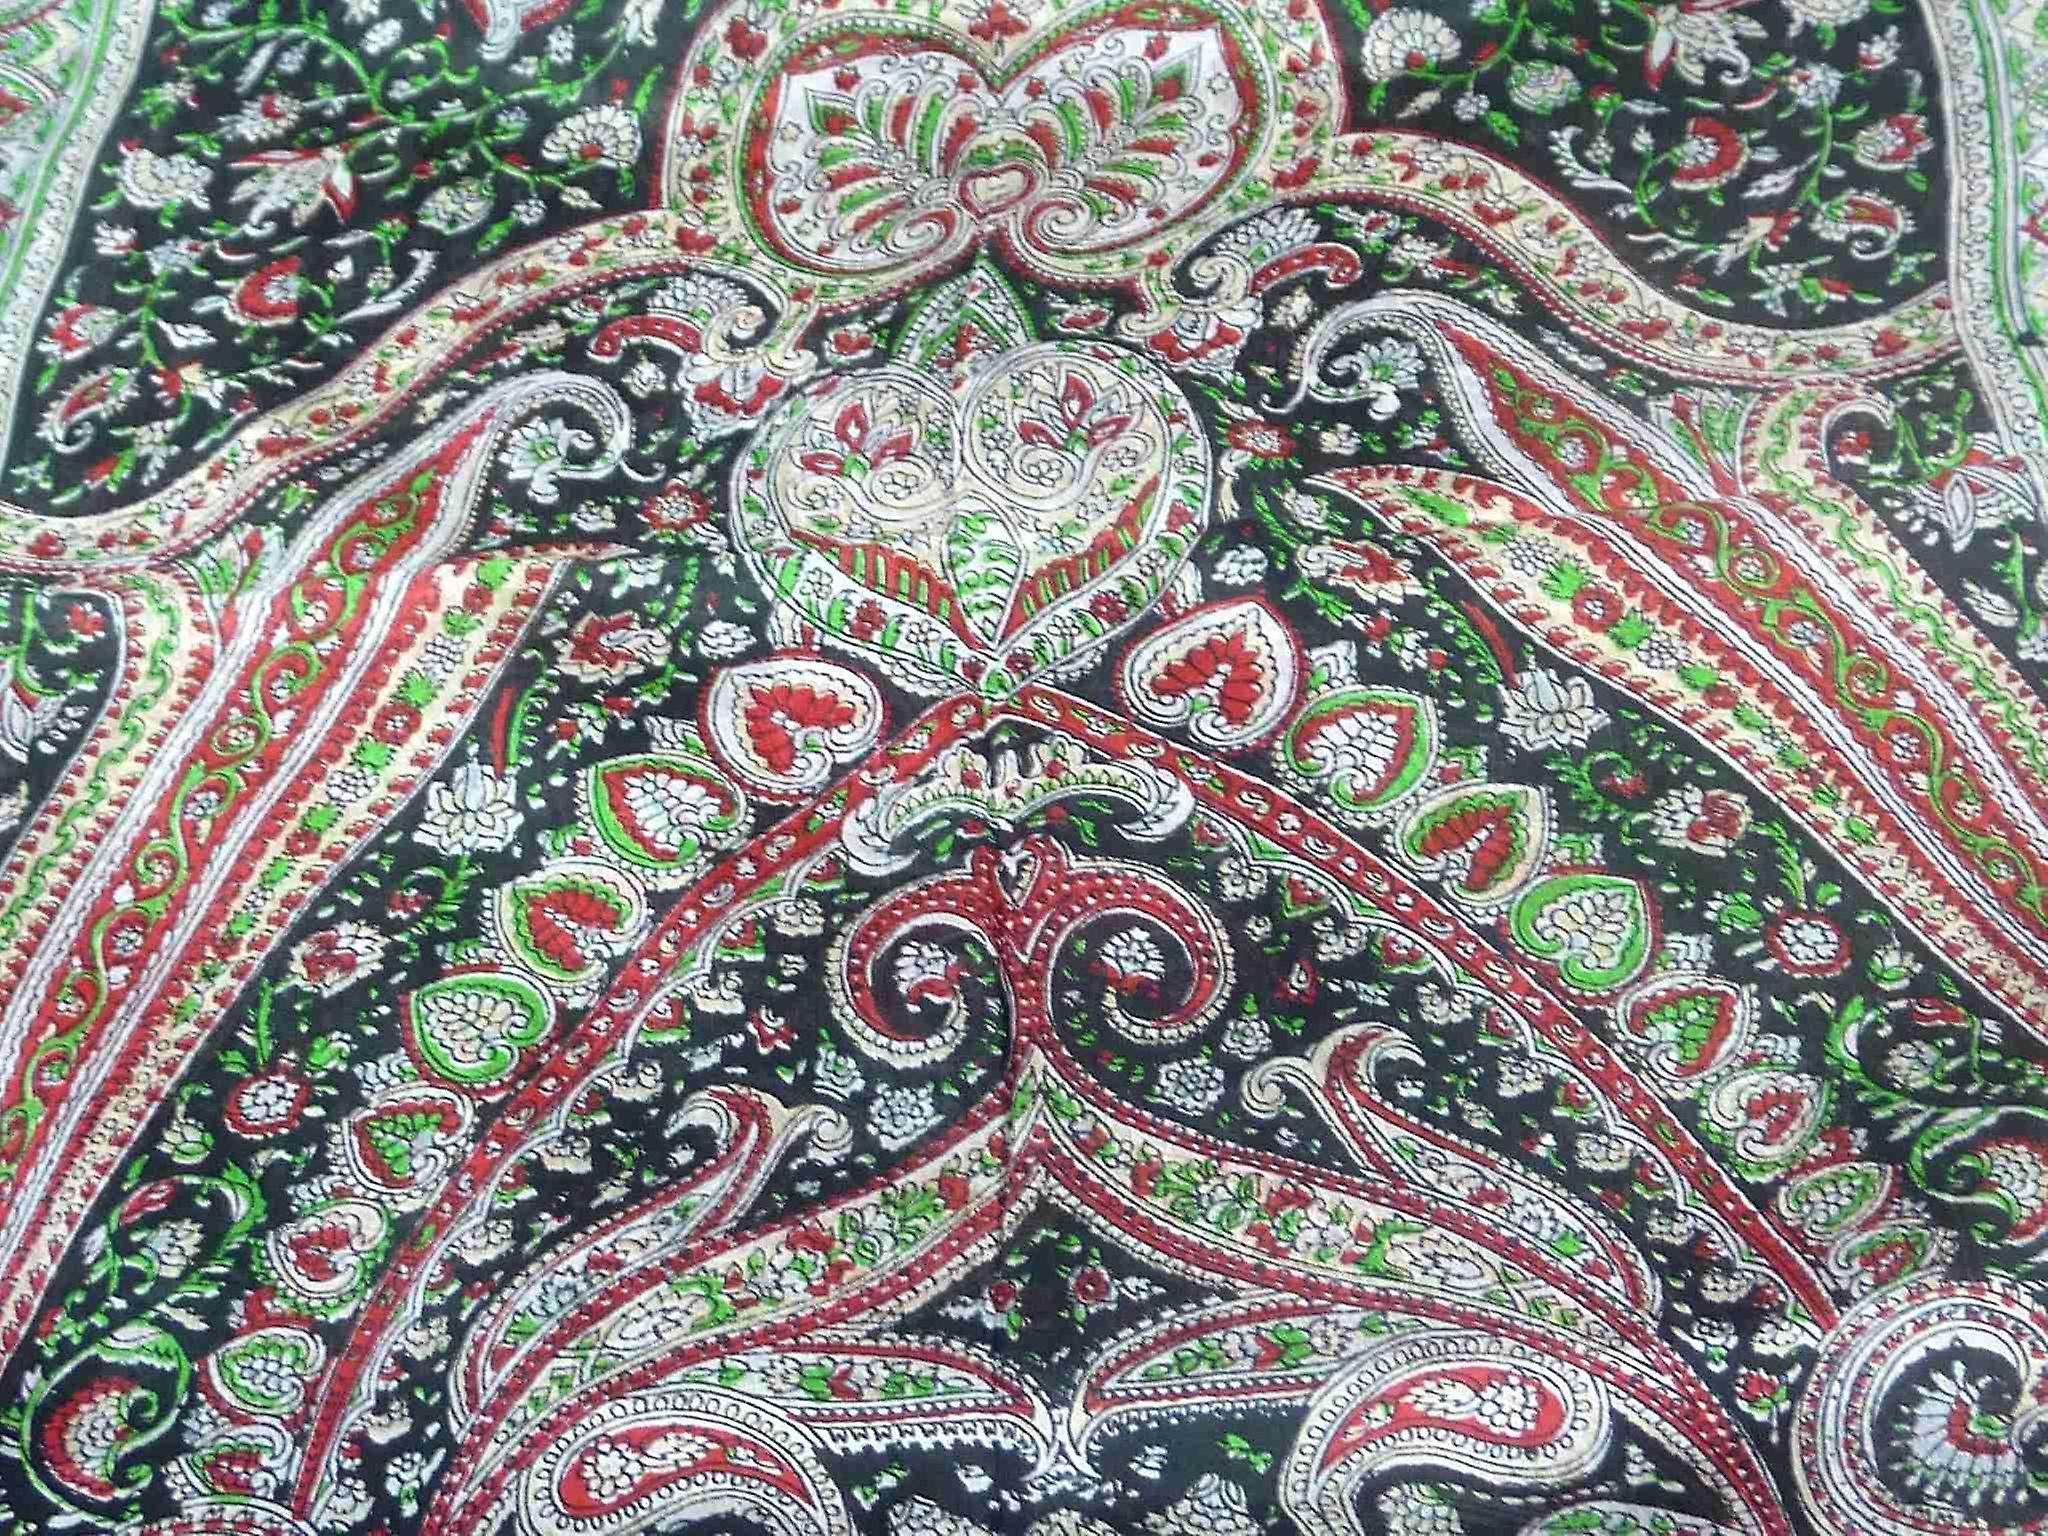 Mulberry Silk Traditional Long Scarf Raxaul Black by Pashmina & Silk